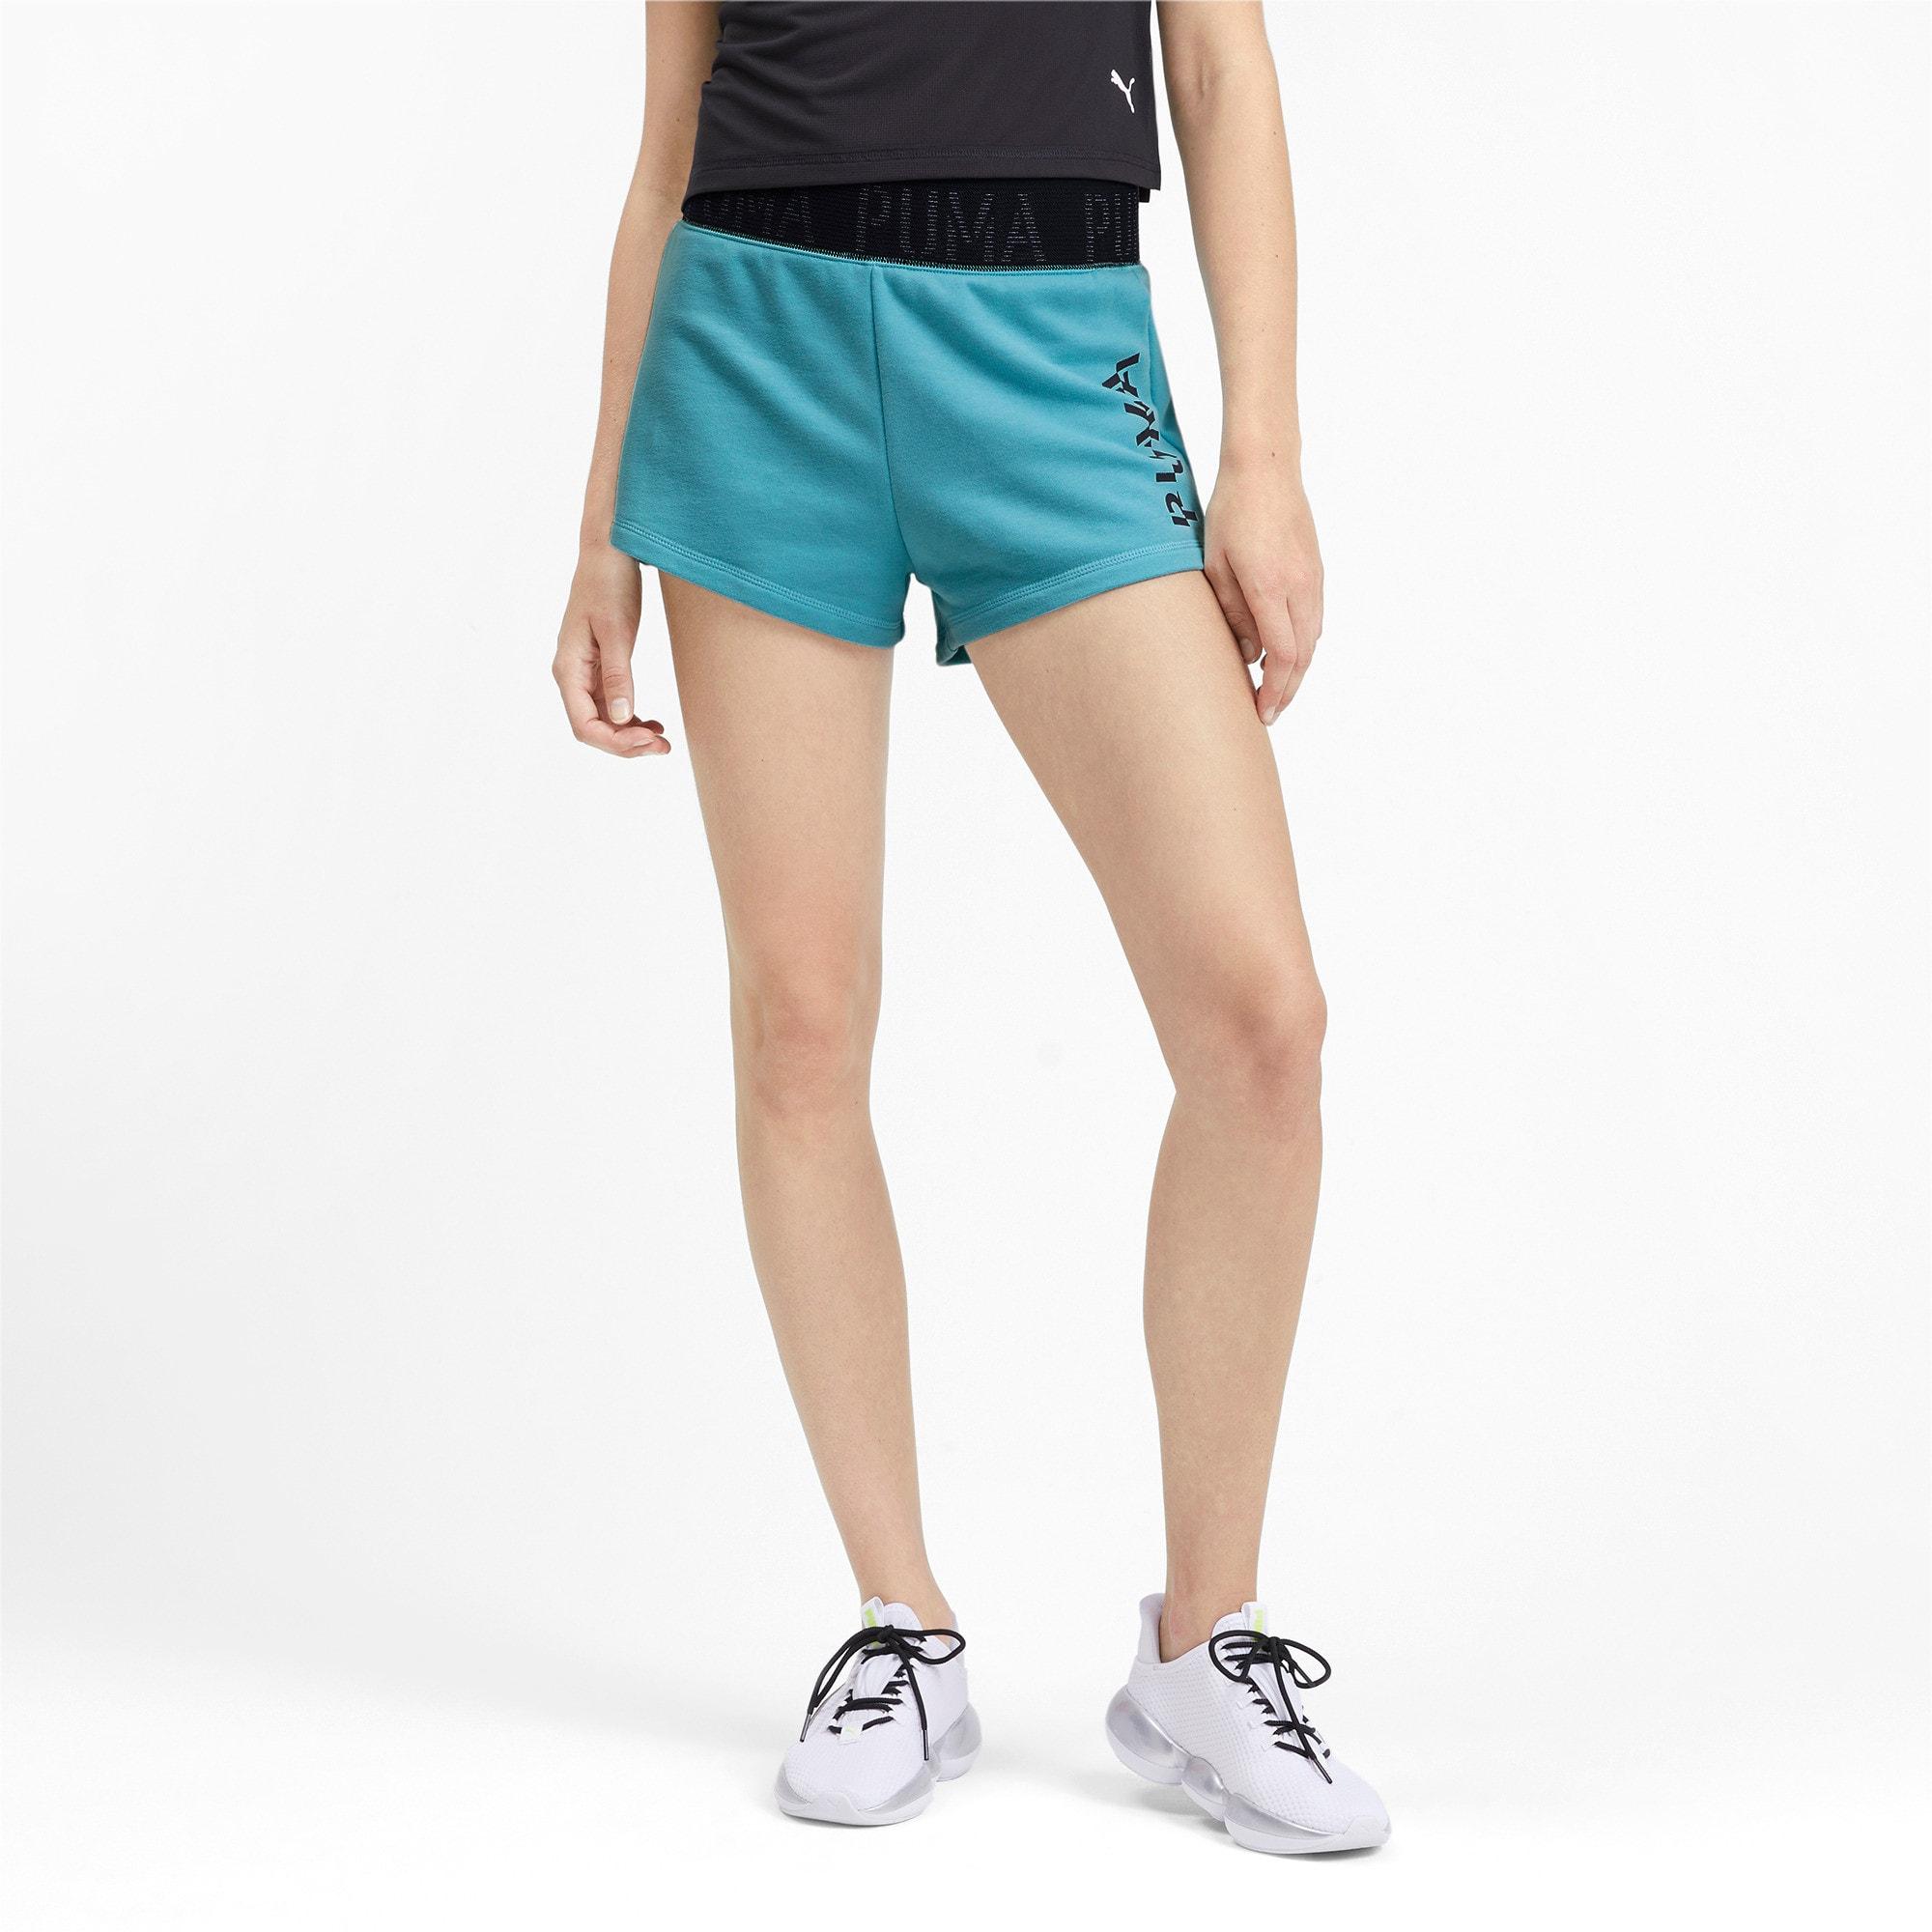 Miniatura 2 de Shorts con logo para mujer, Milky Blue Heather, mediano